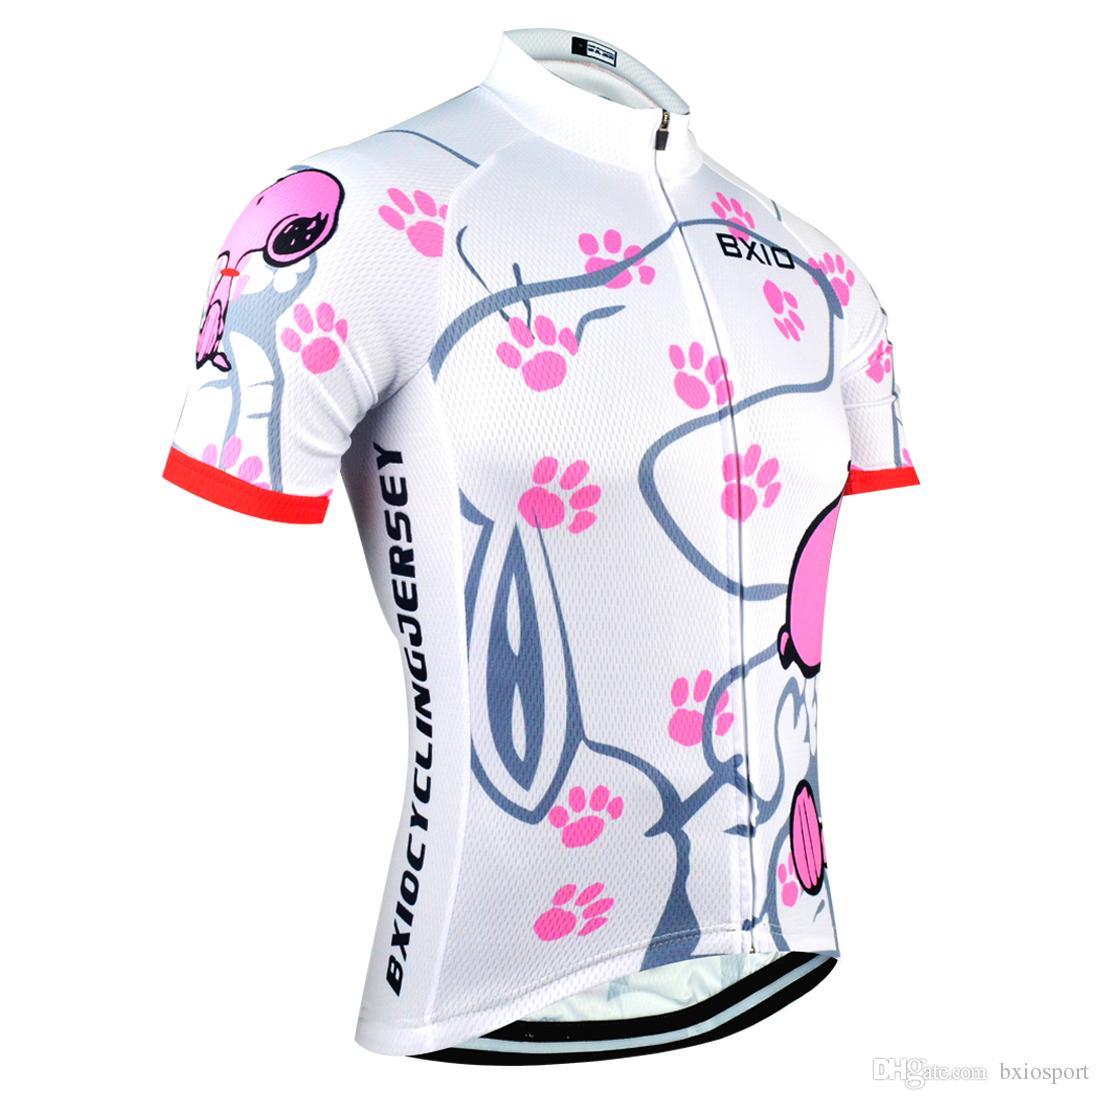 d1790414193a BXIO marca ciclismo Jersey mujer manga corta deporte Jersey verano Cool  Snoopy Bike ropa pro equipo equipe de france BX-0209W021-J